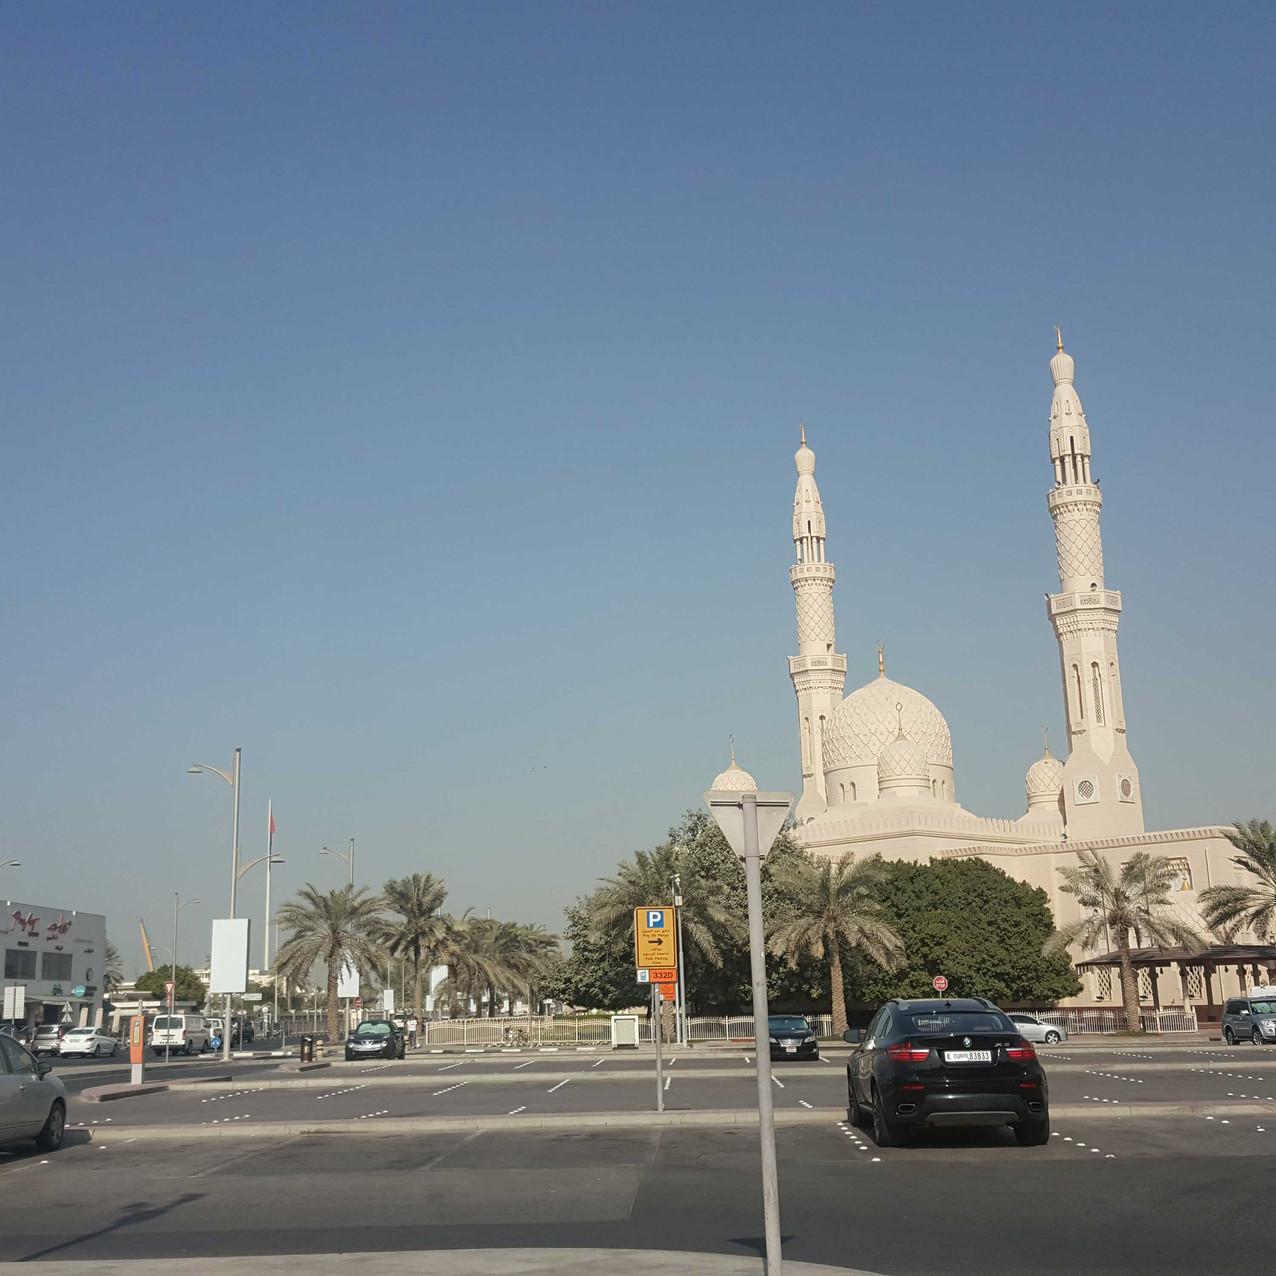 heikh Zayed Grand Mosque Center